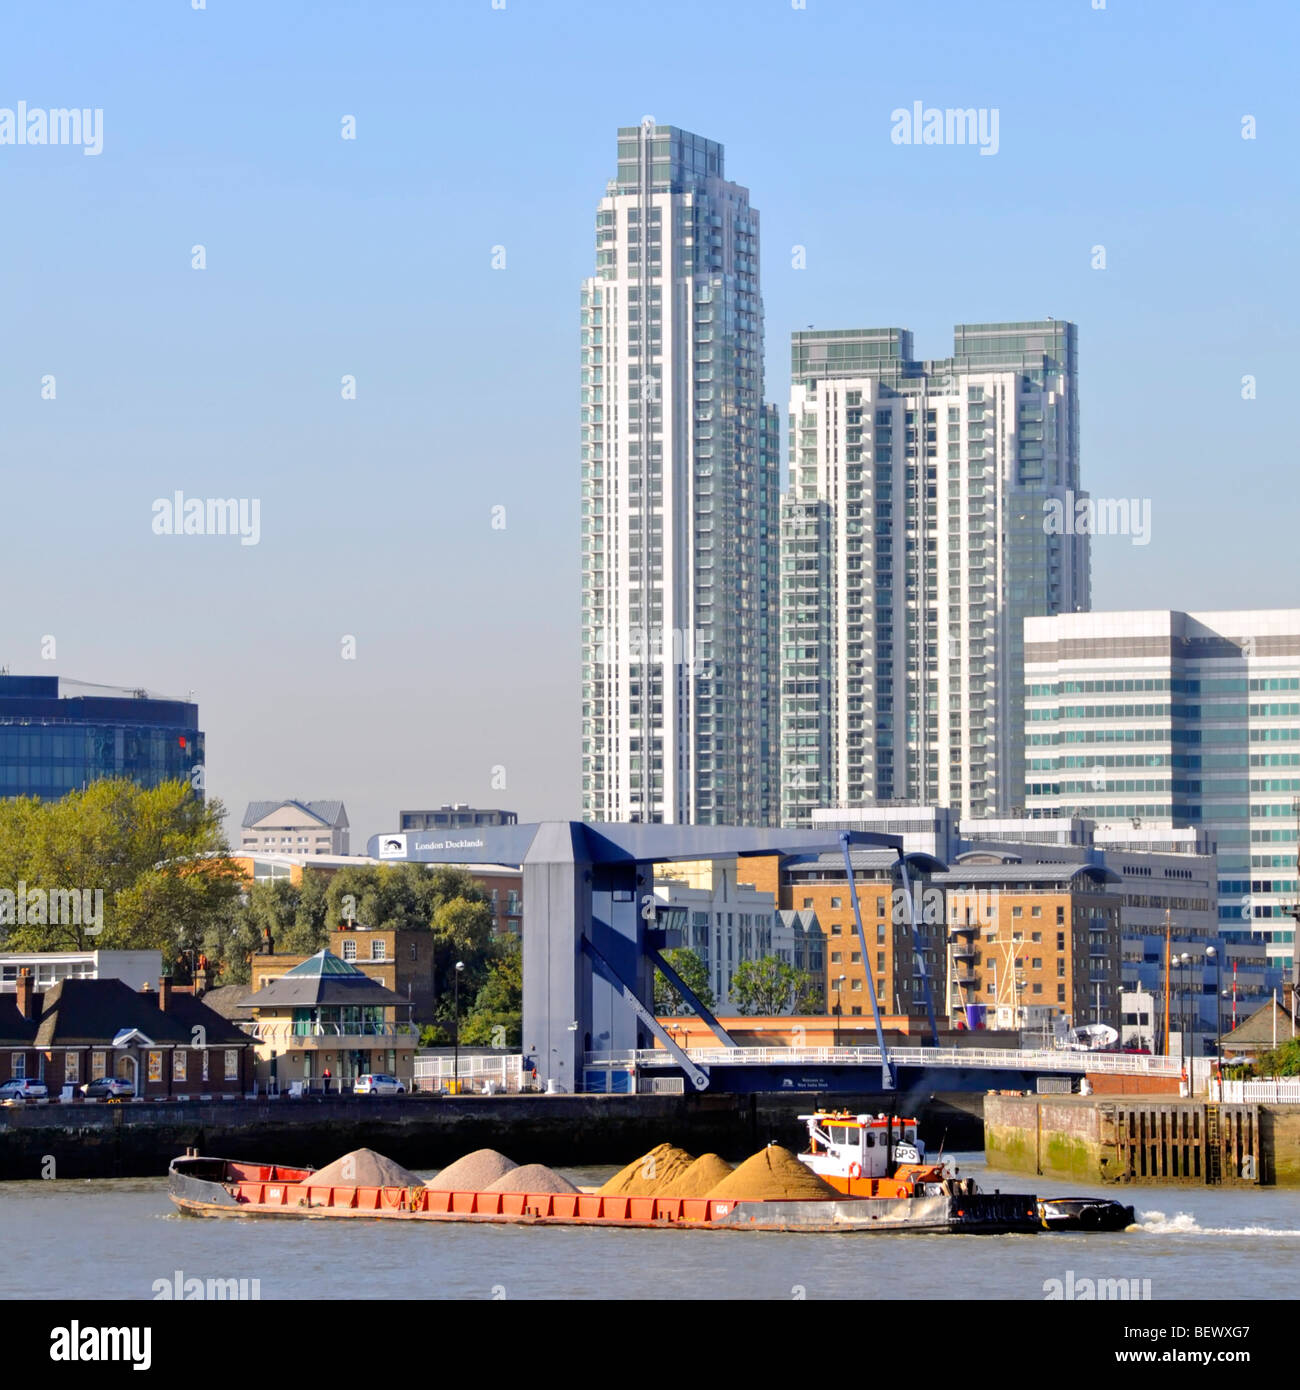 Kirby Station Apartments: Tug Boat Barge Transport Stock Photos & Tug Boat Barge